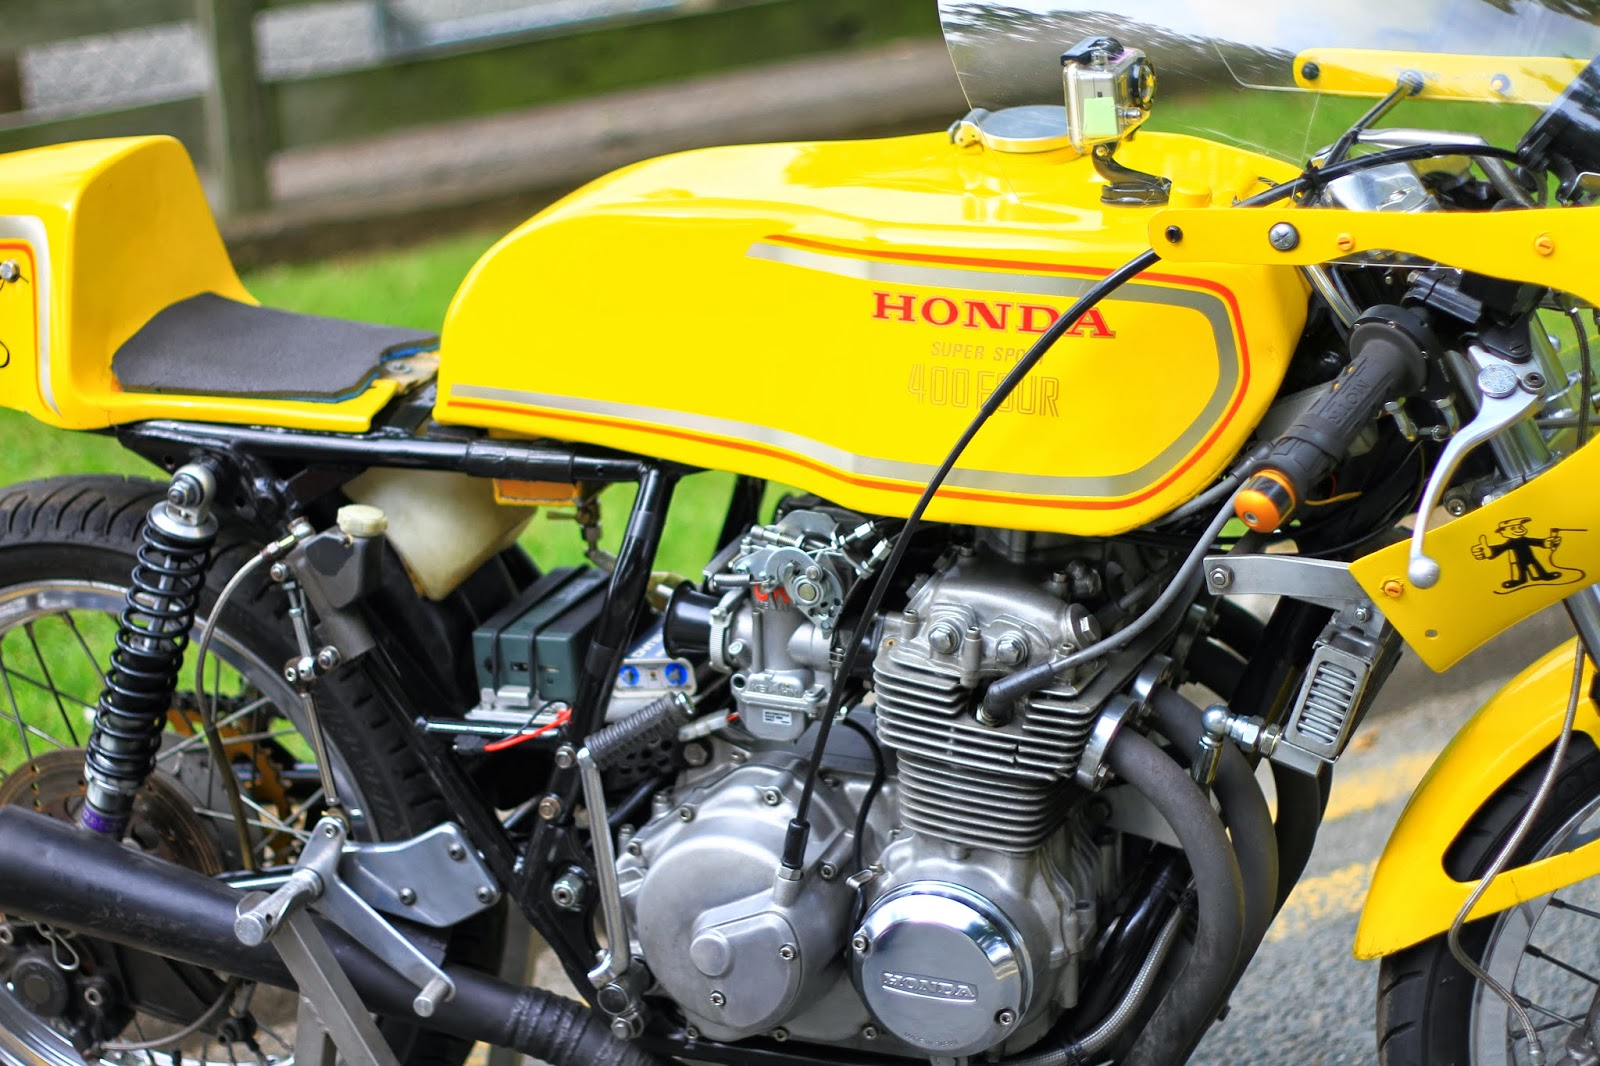 manuale honda 400 four best setting instruction guide u2022 rh ourk9 co 1976 Honda 400 Four 1976 Honda 400 Motorcycle